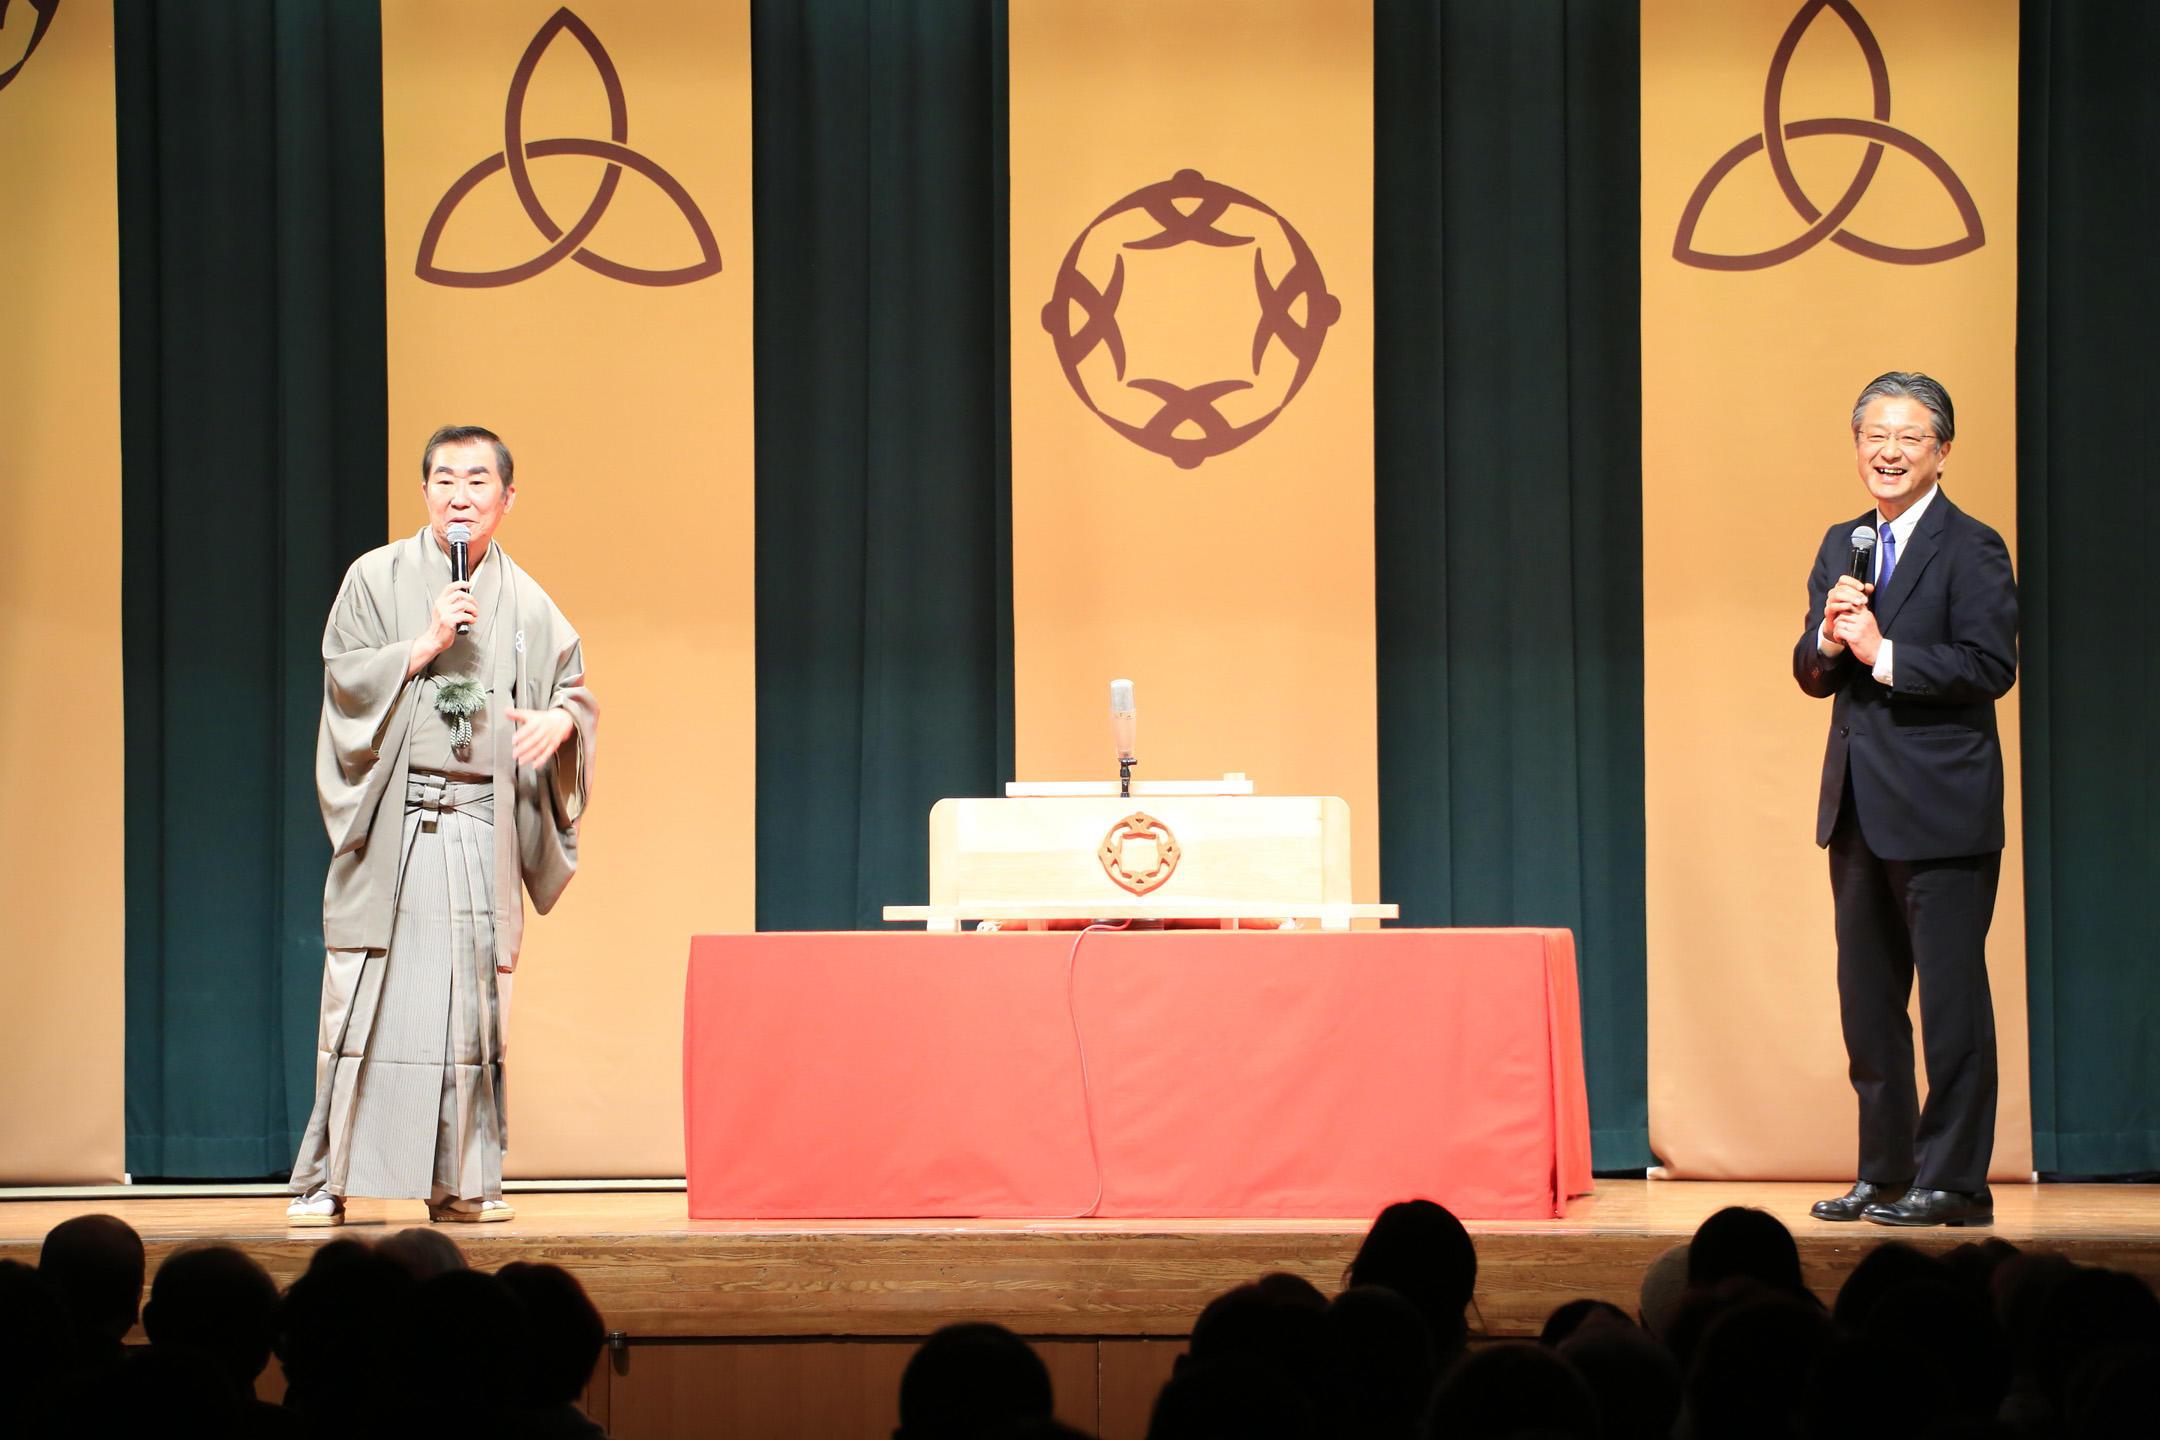 http://news.yoshimoto.co.jp/20190130181757-e4014ff886b115ae8826f4a316dffc33c947c17e.jpg